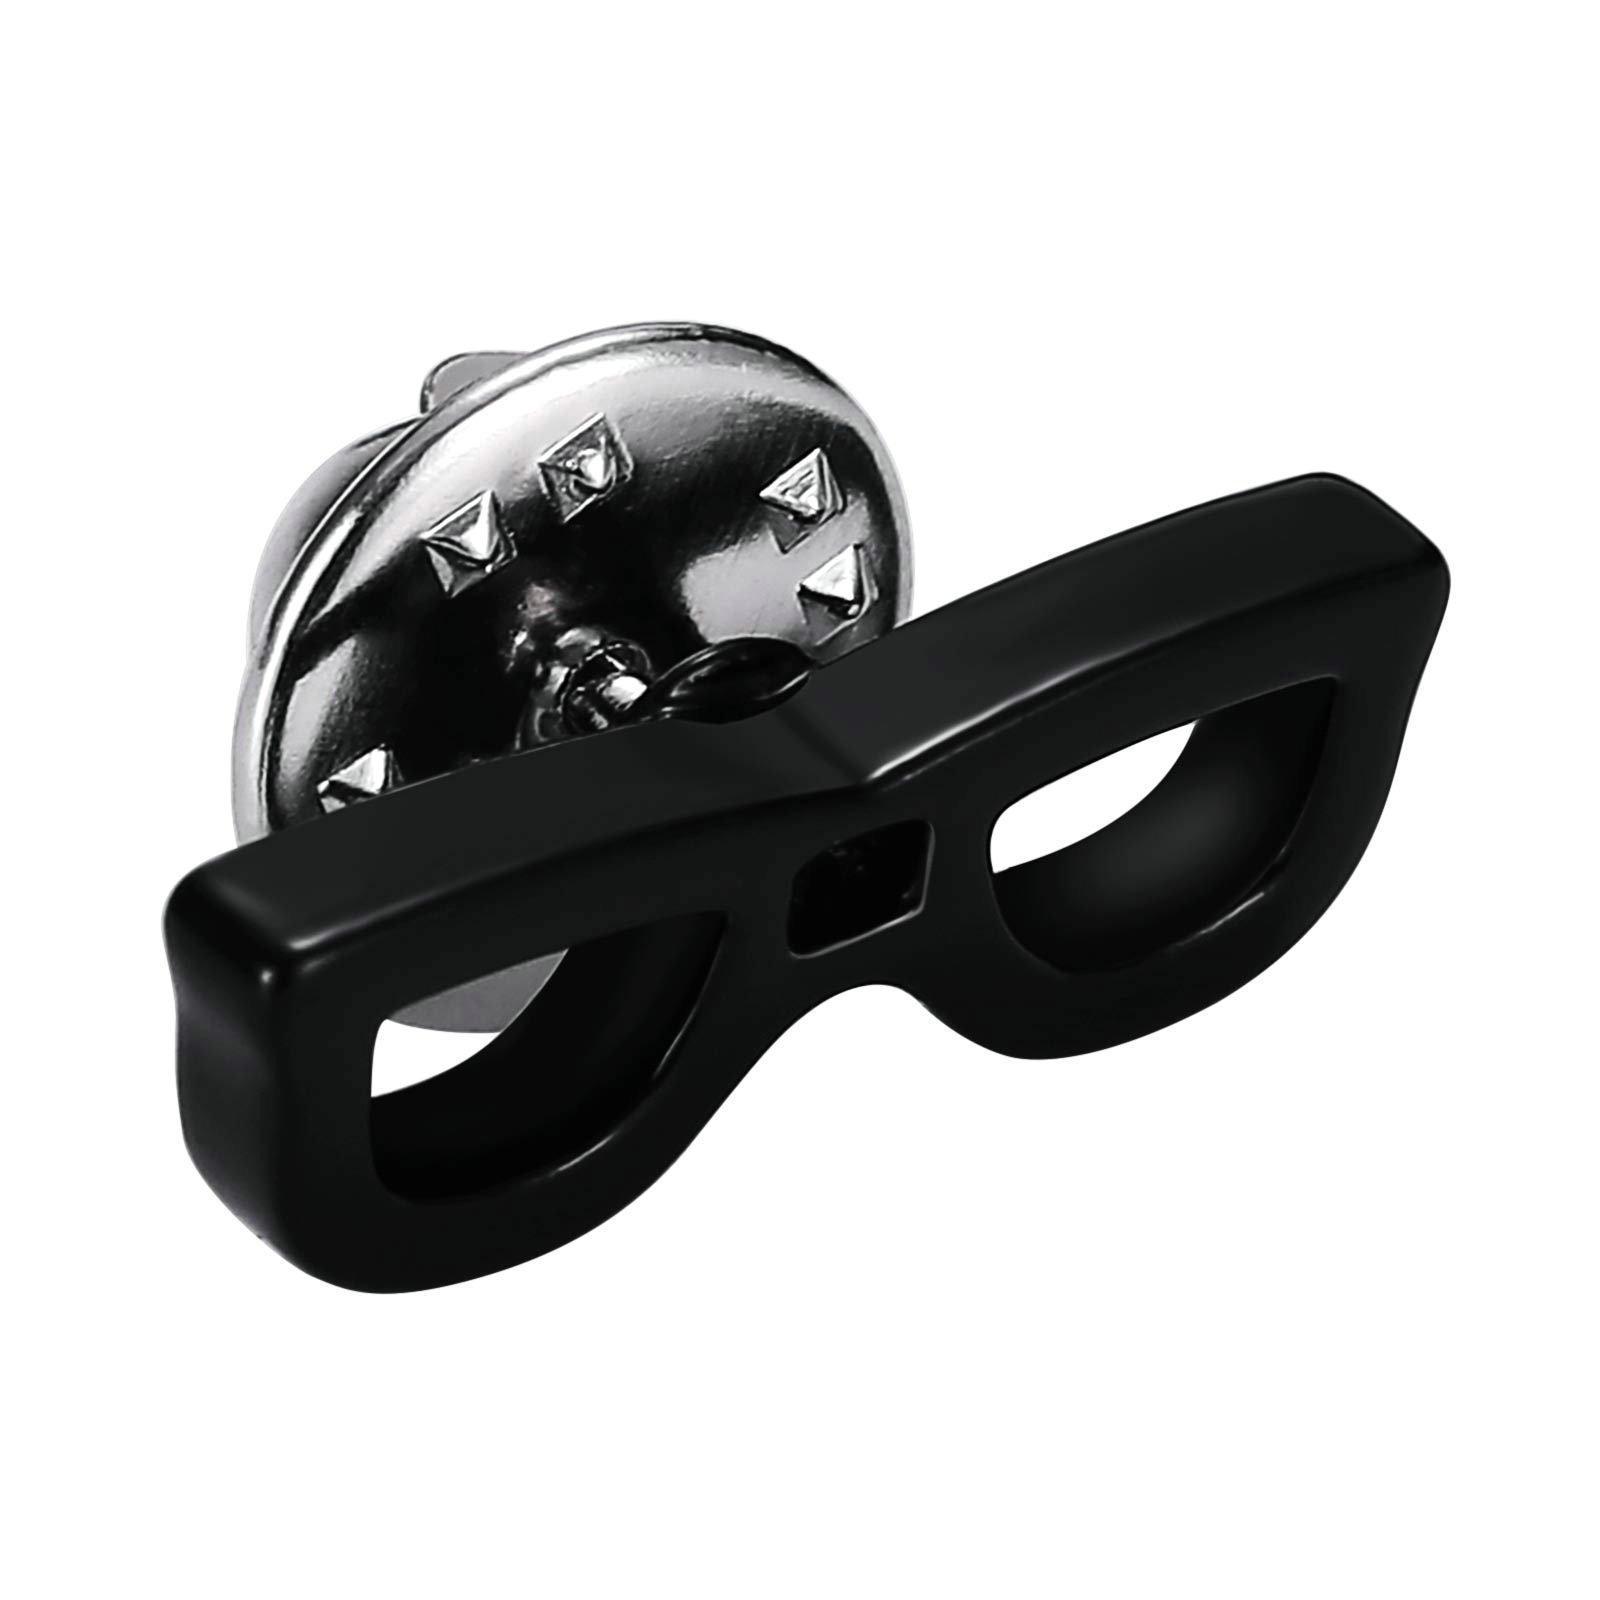 Daesar Jewelry Stainless Steel Summer Sun Glasses Sunrays Black Mens Cufflinks